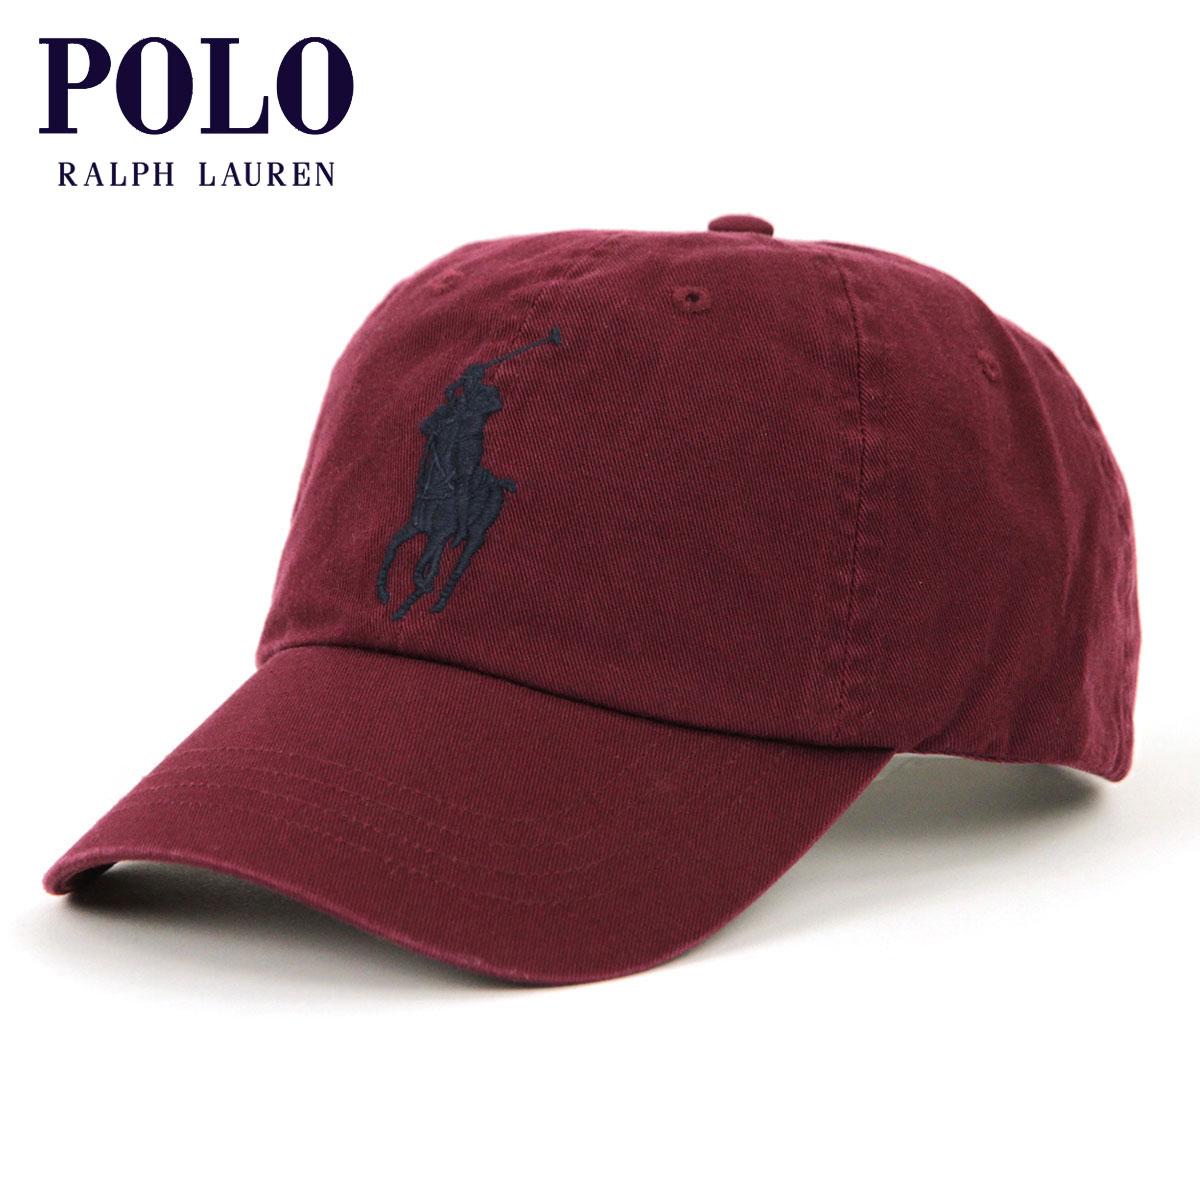 8660c0c741fb7 Polo Ralph Lauren POLO RALPH LAUREN regular article men cap hat BIG PONY  COTTON CHINO BASEBALL CAP